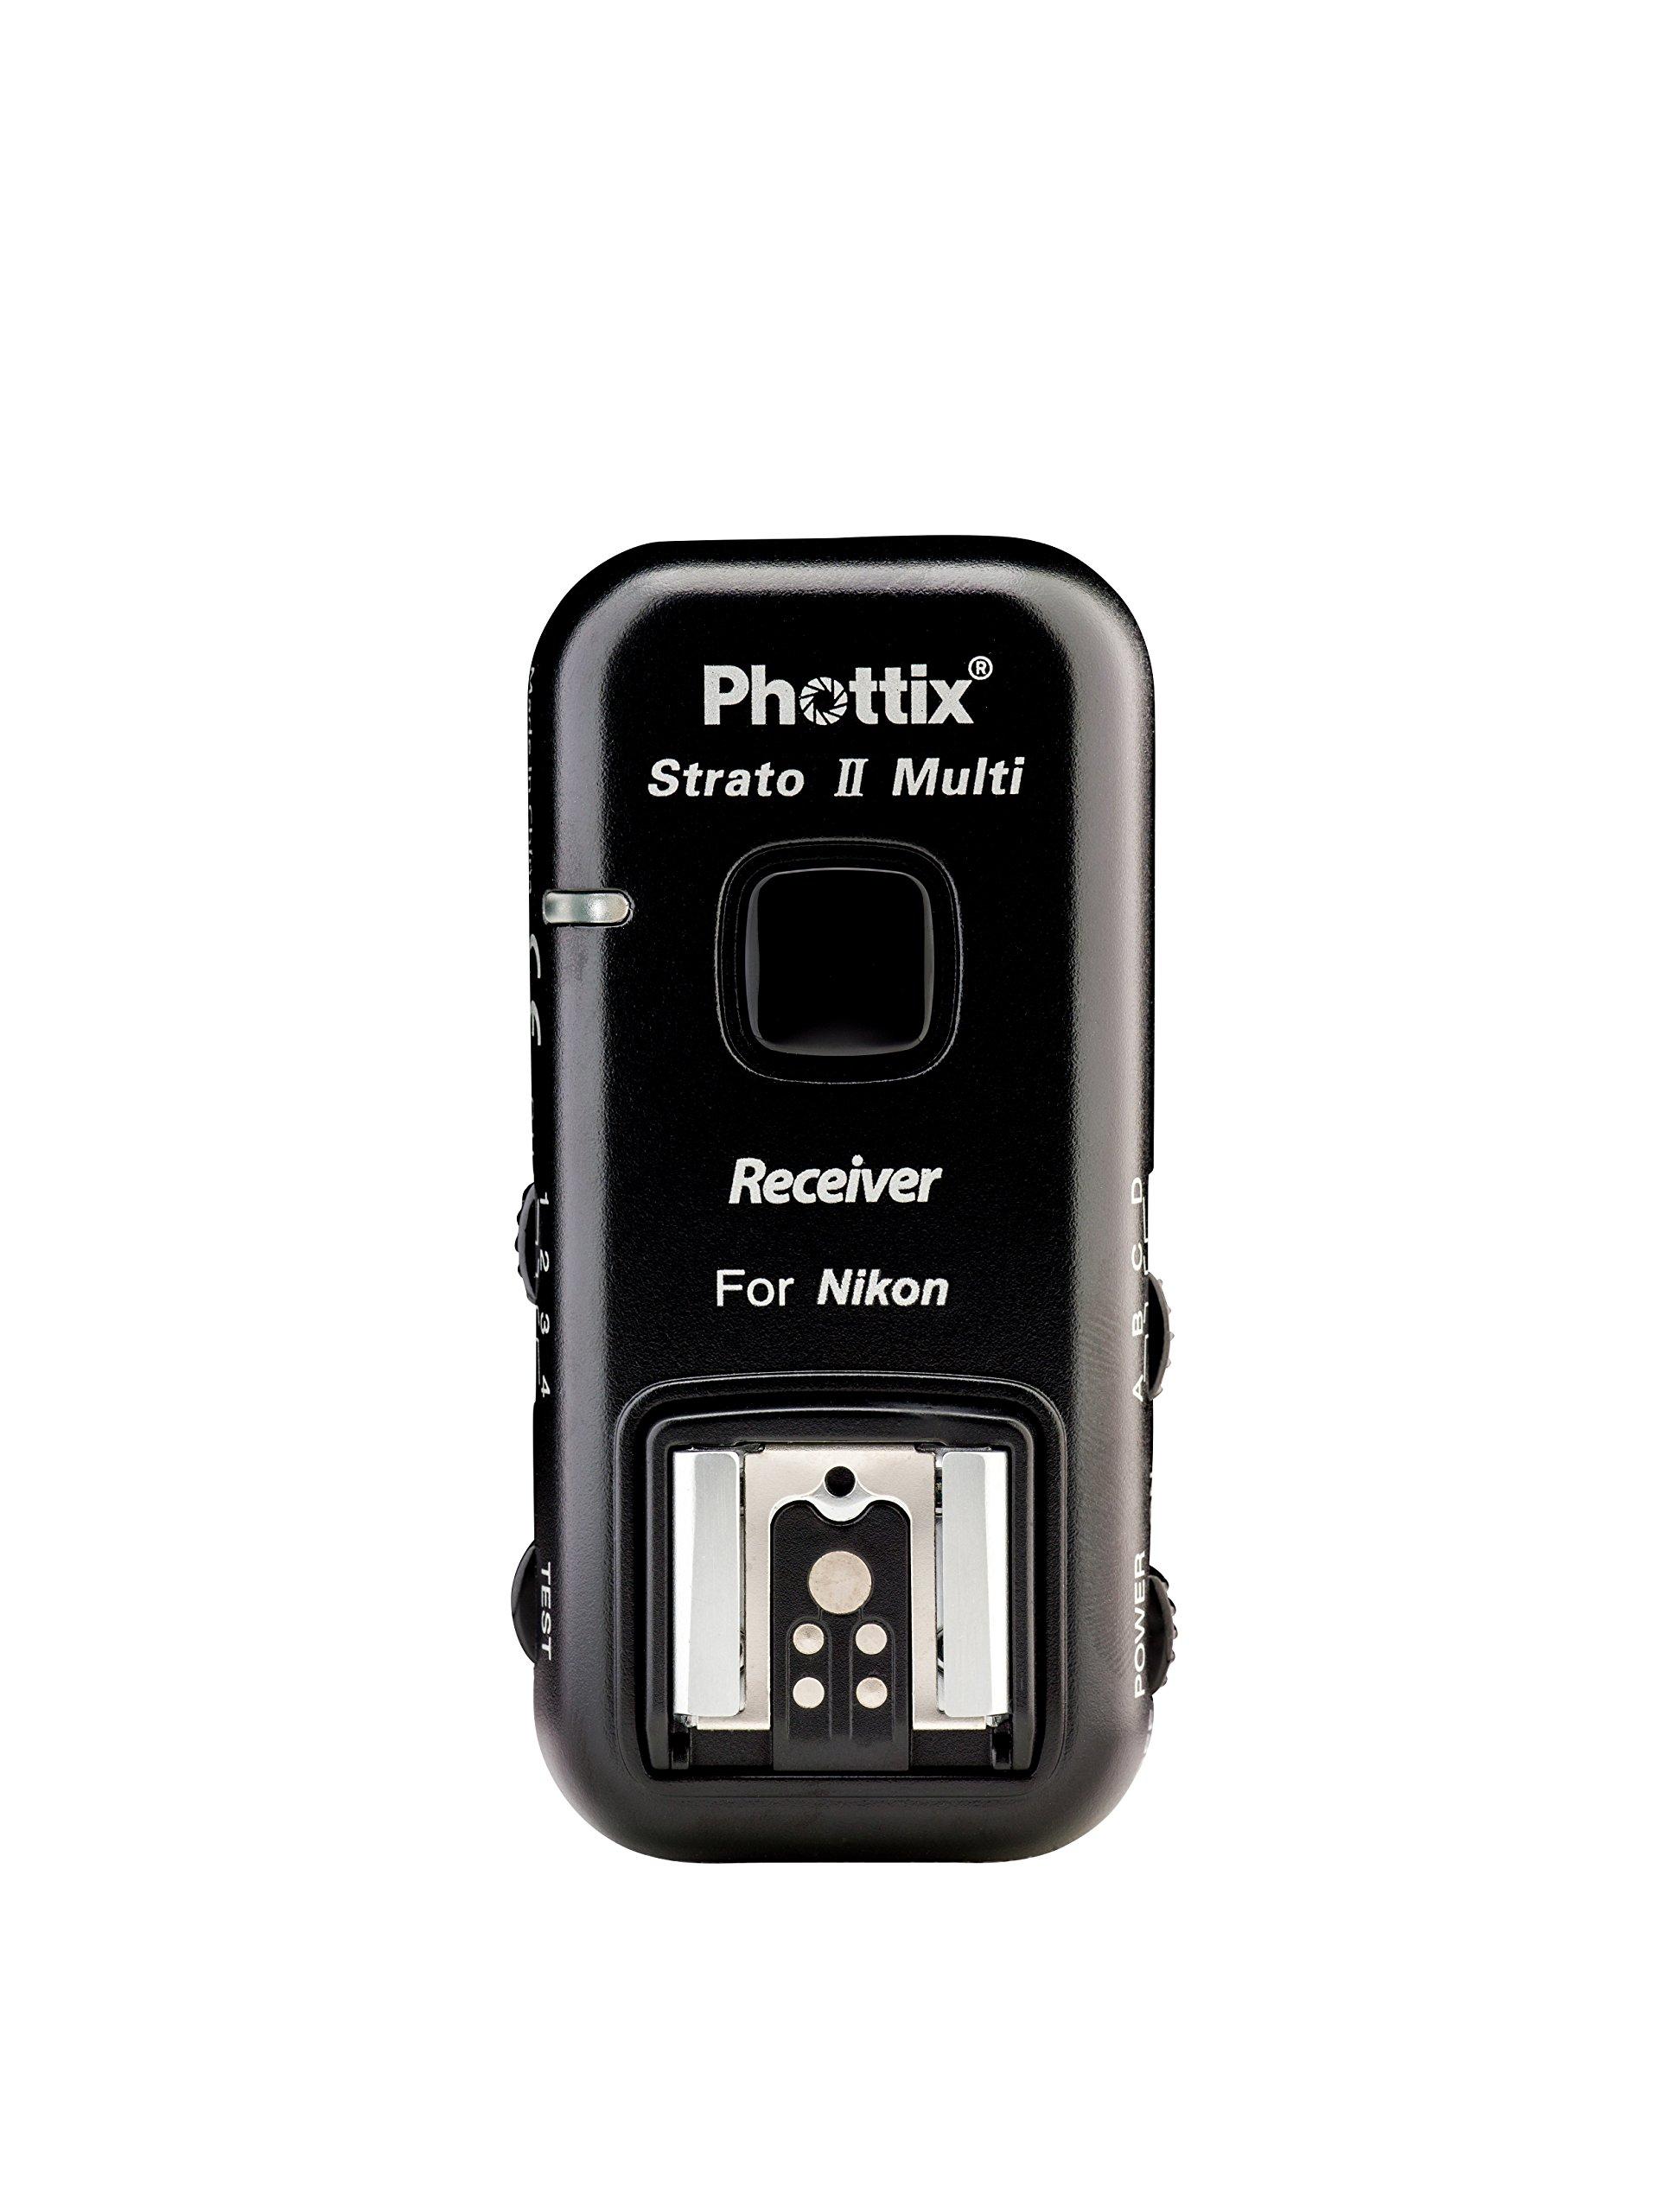 Phottix Stratos II Multi 5-In-1 Nikon Receiver